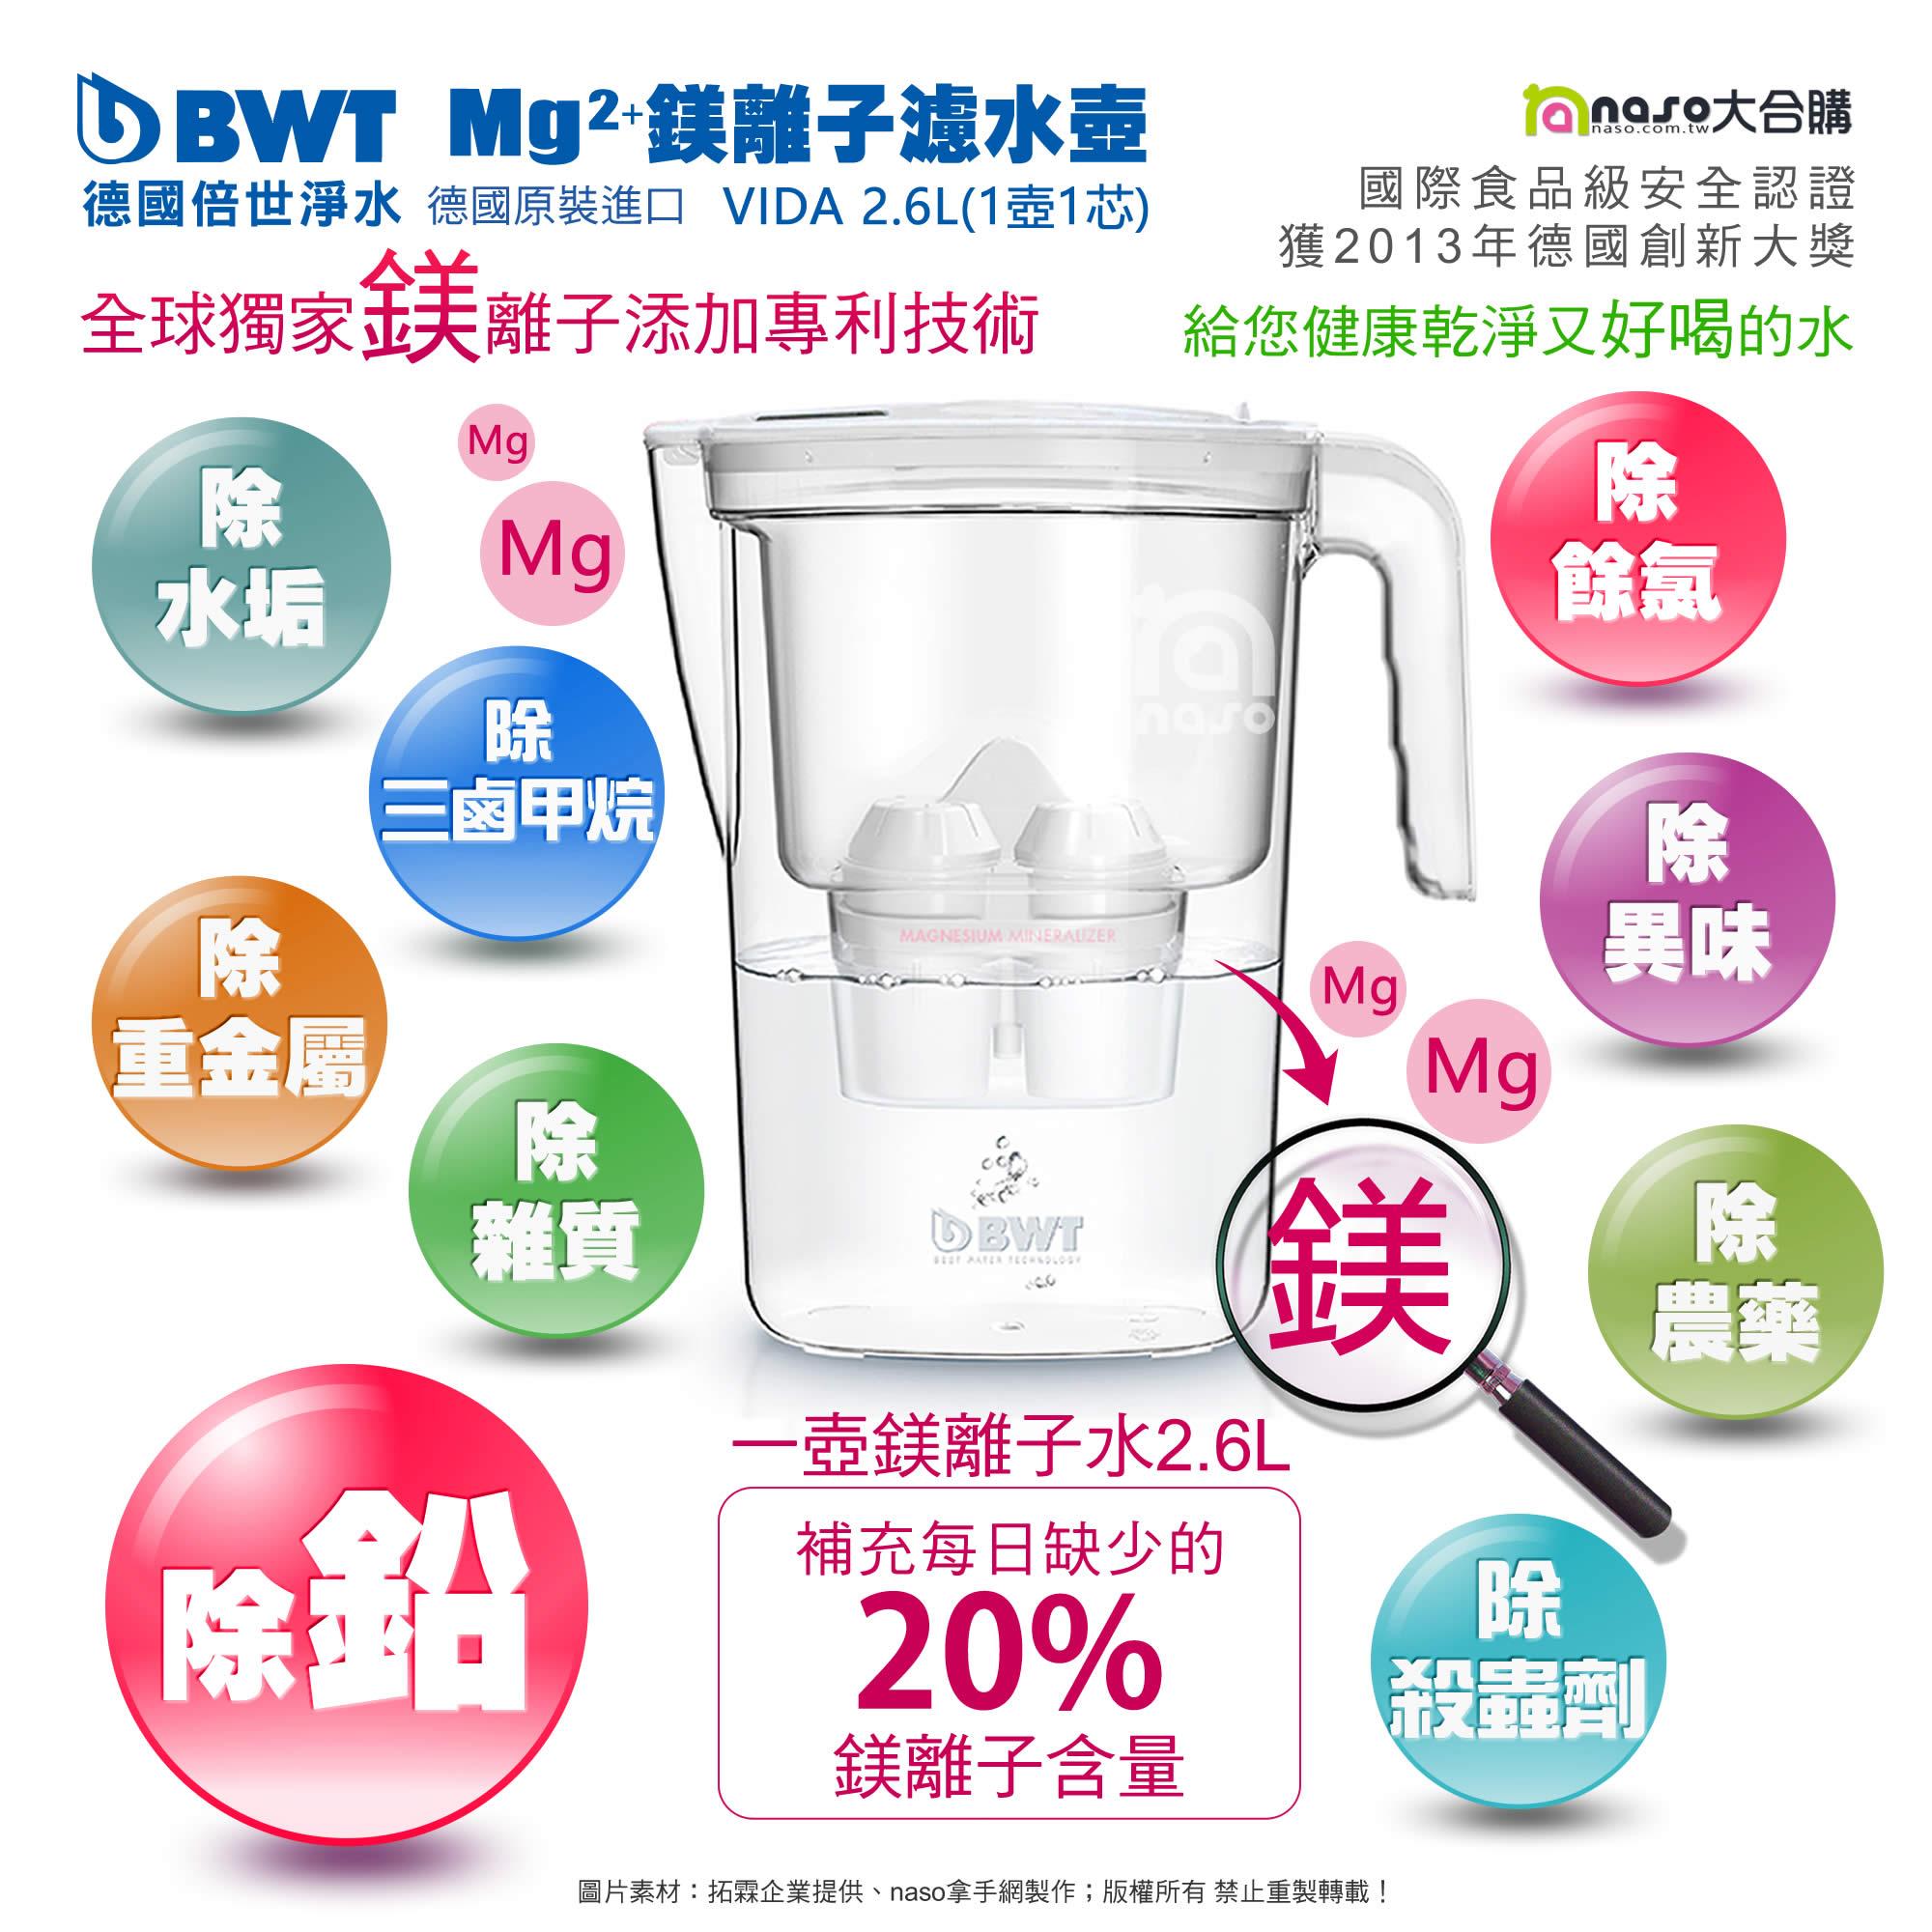 【BWT德國倍世】Mg2+鎂離子健康濾水壺 VIDA 2.6L 好評第6團